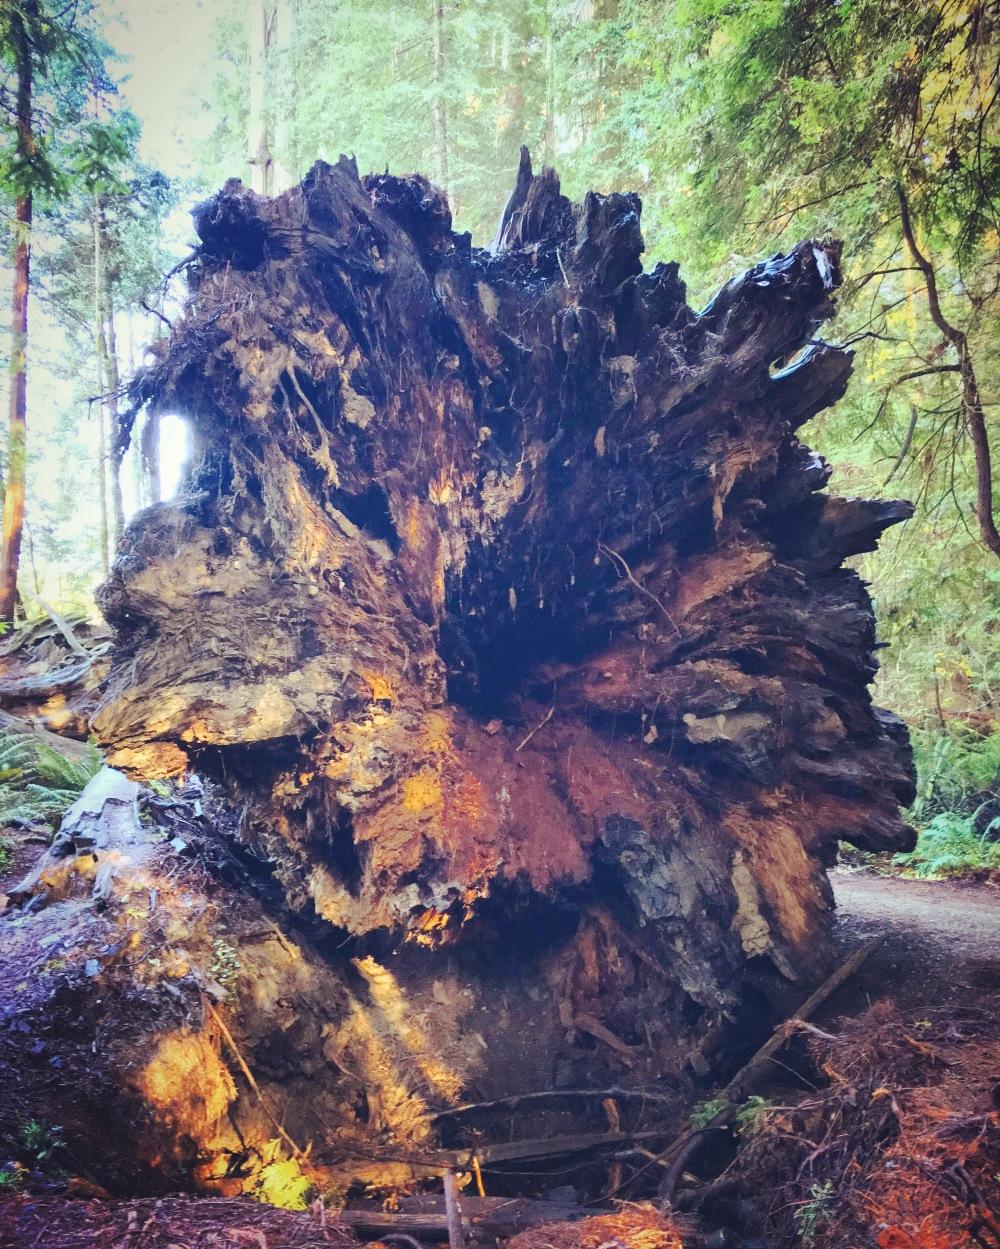 StoutGroveRedwoods